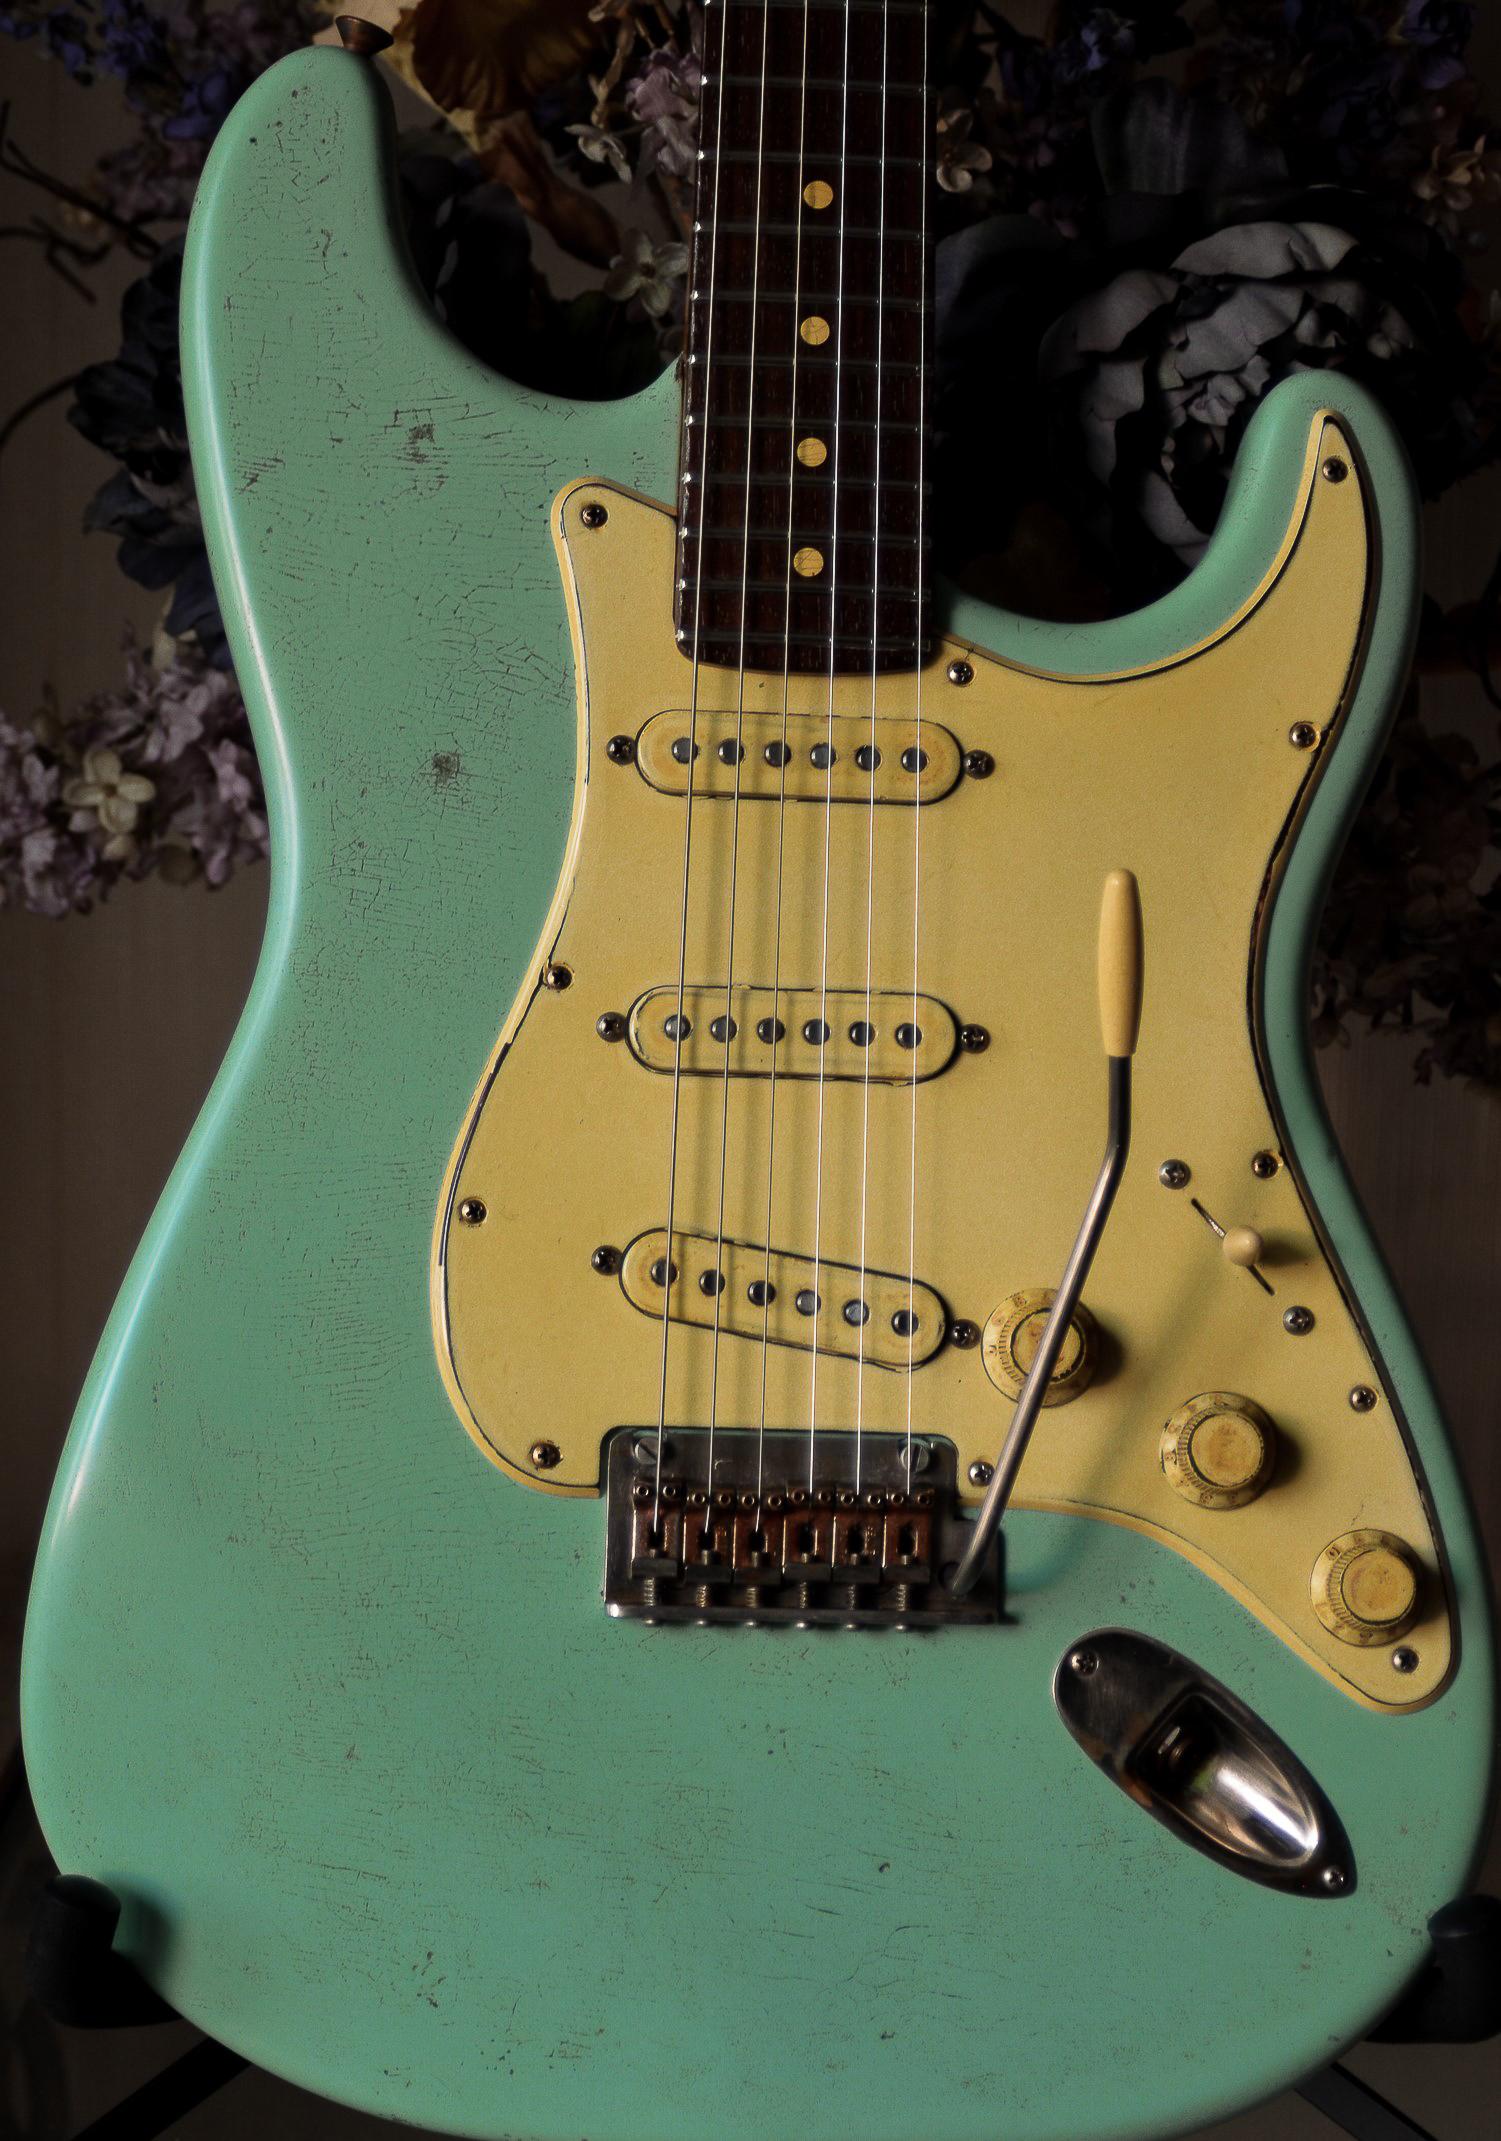 Fender Stratocaster Relic Guitar Surf Green